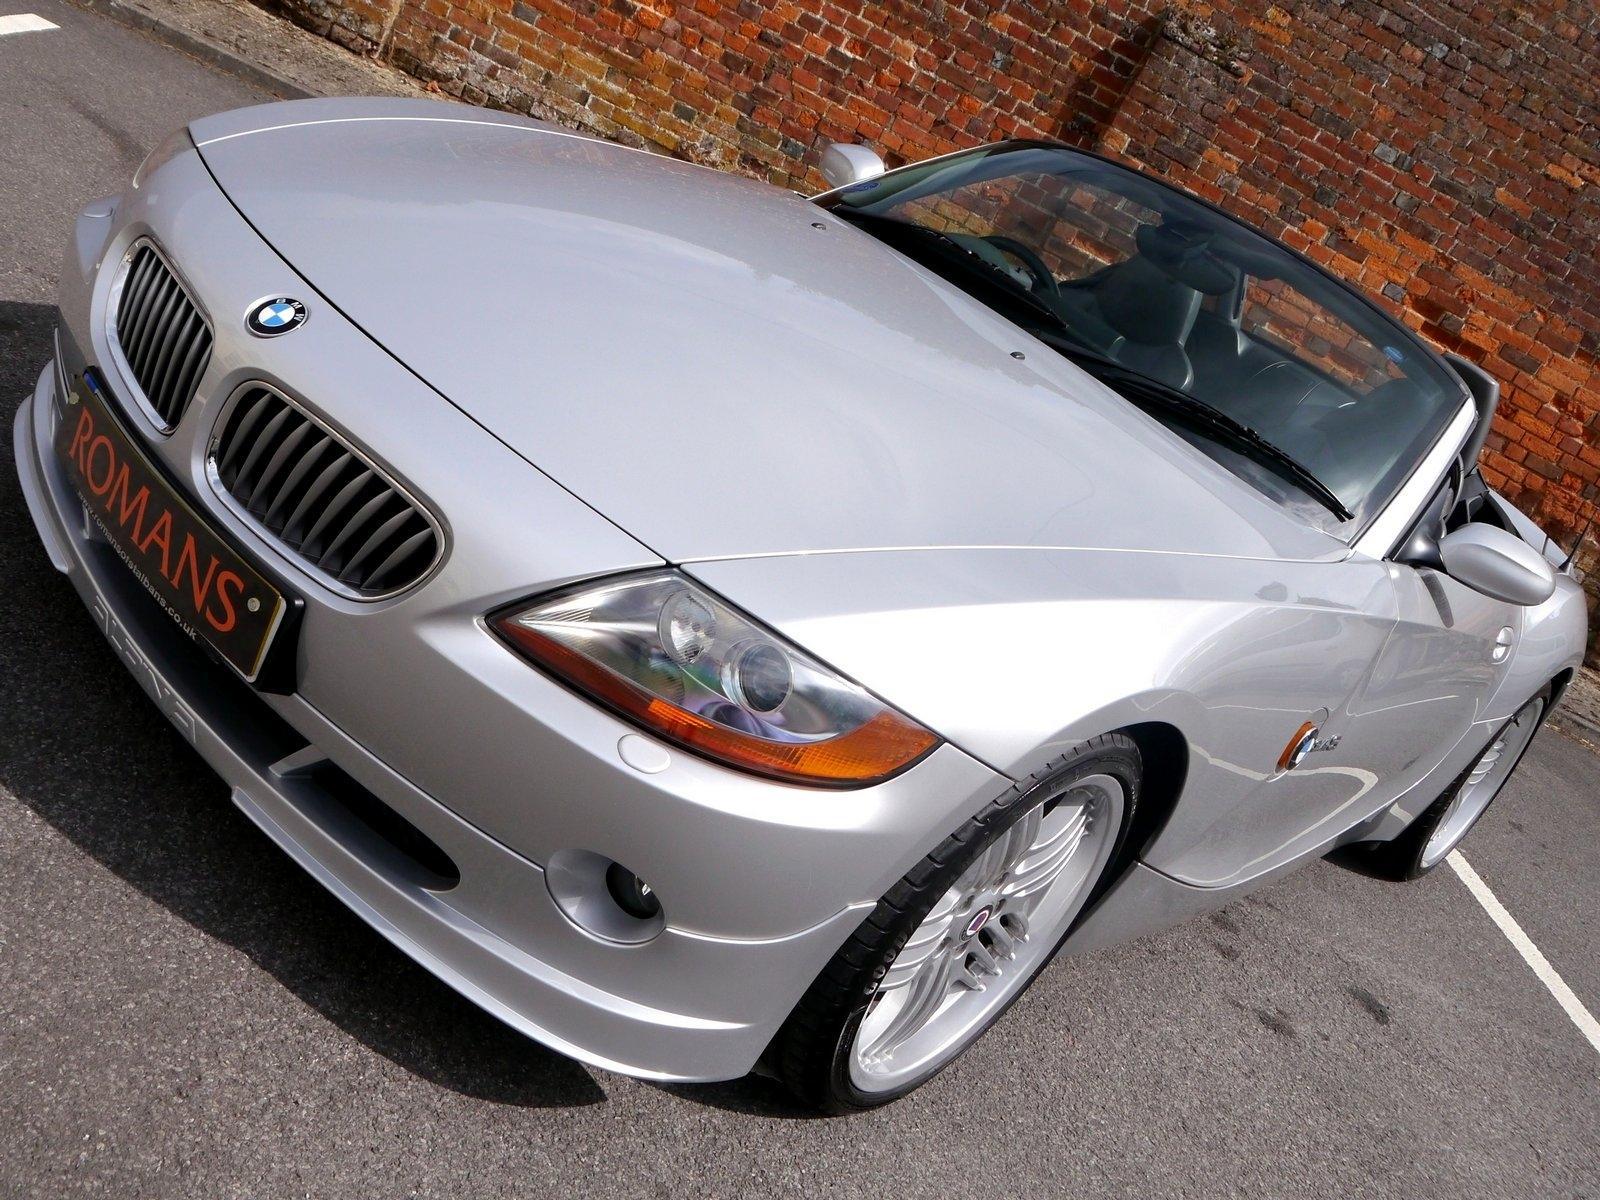 BMWALPINA ROADSTER 3.4 S LUX - RARE VEHICLE - BMW FSH #6